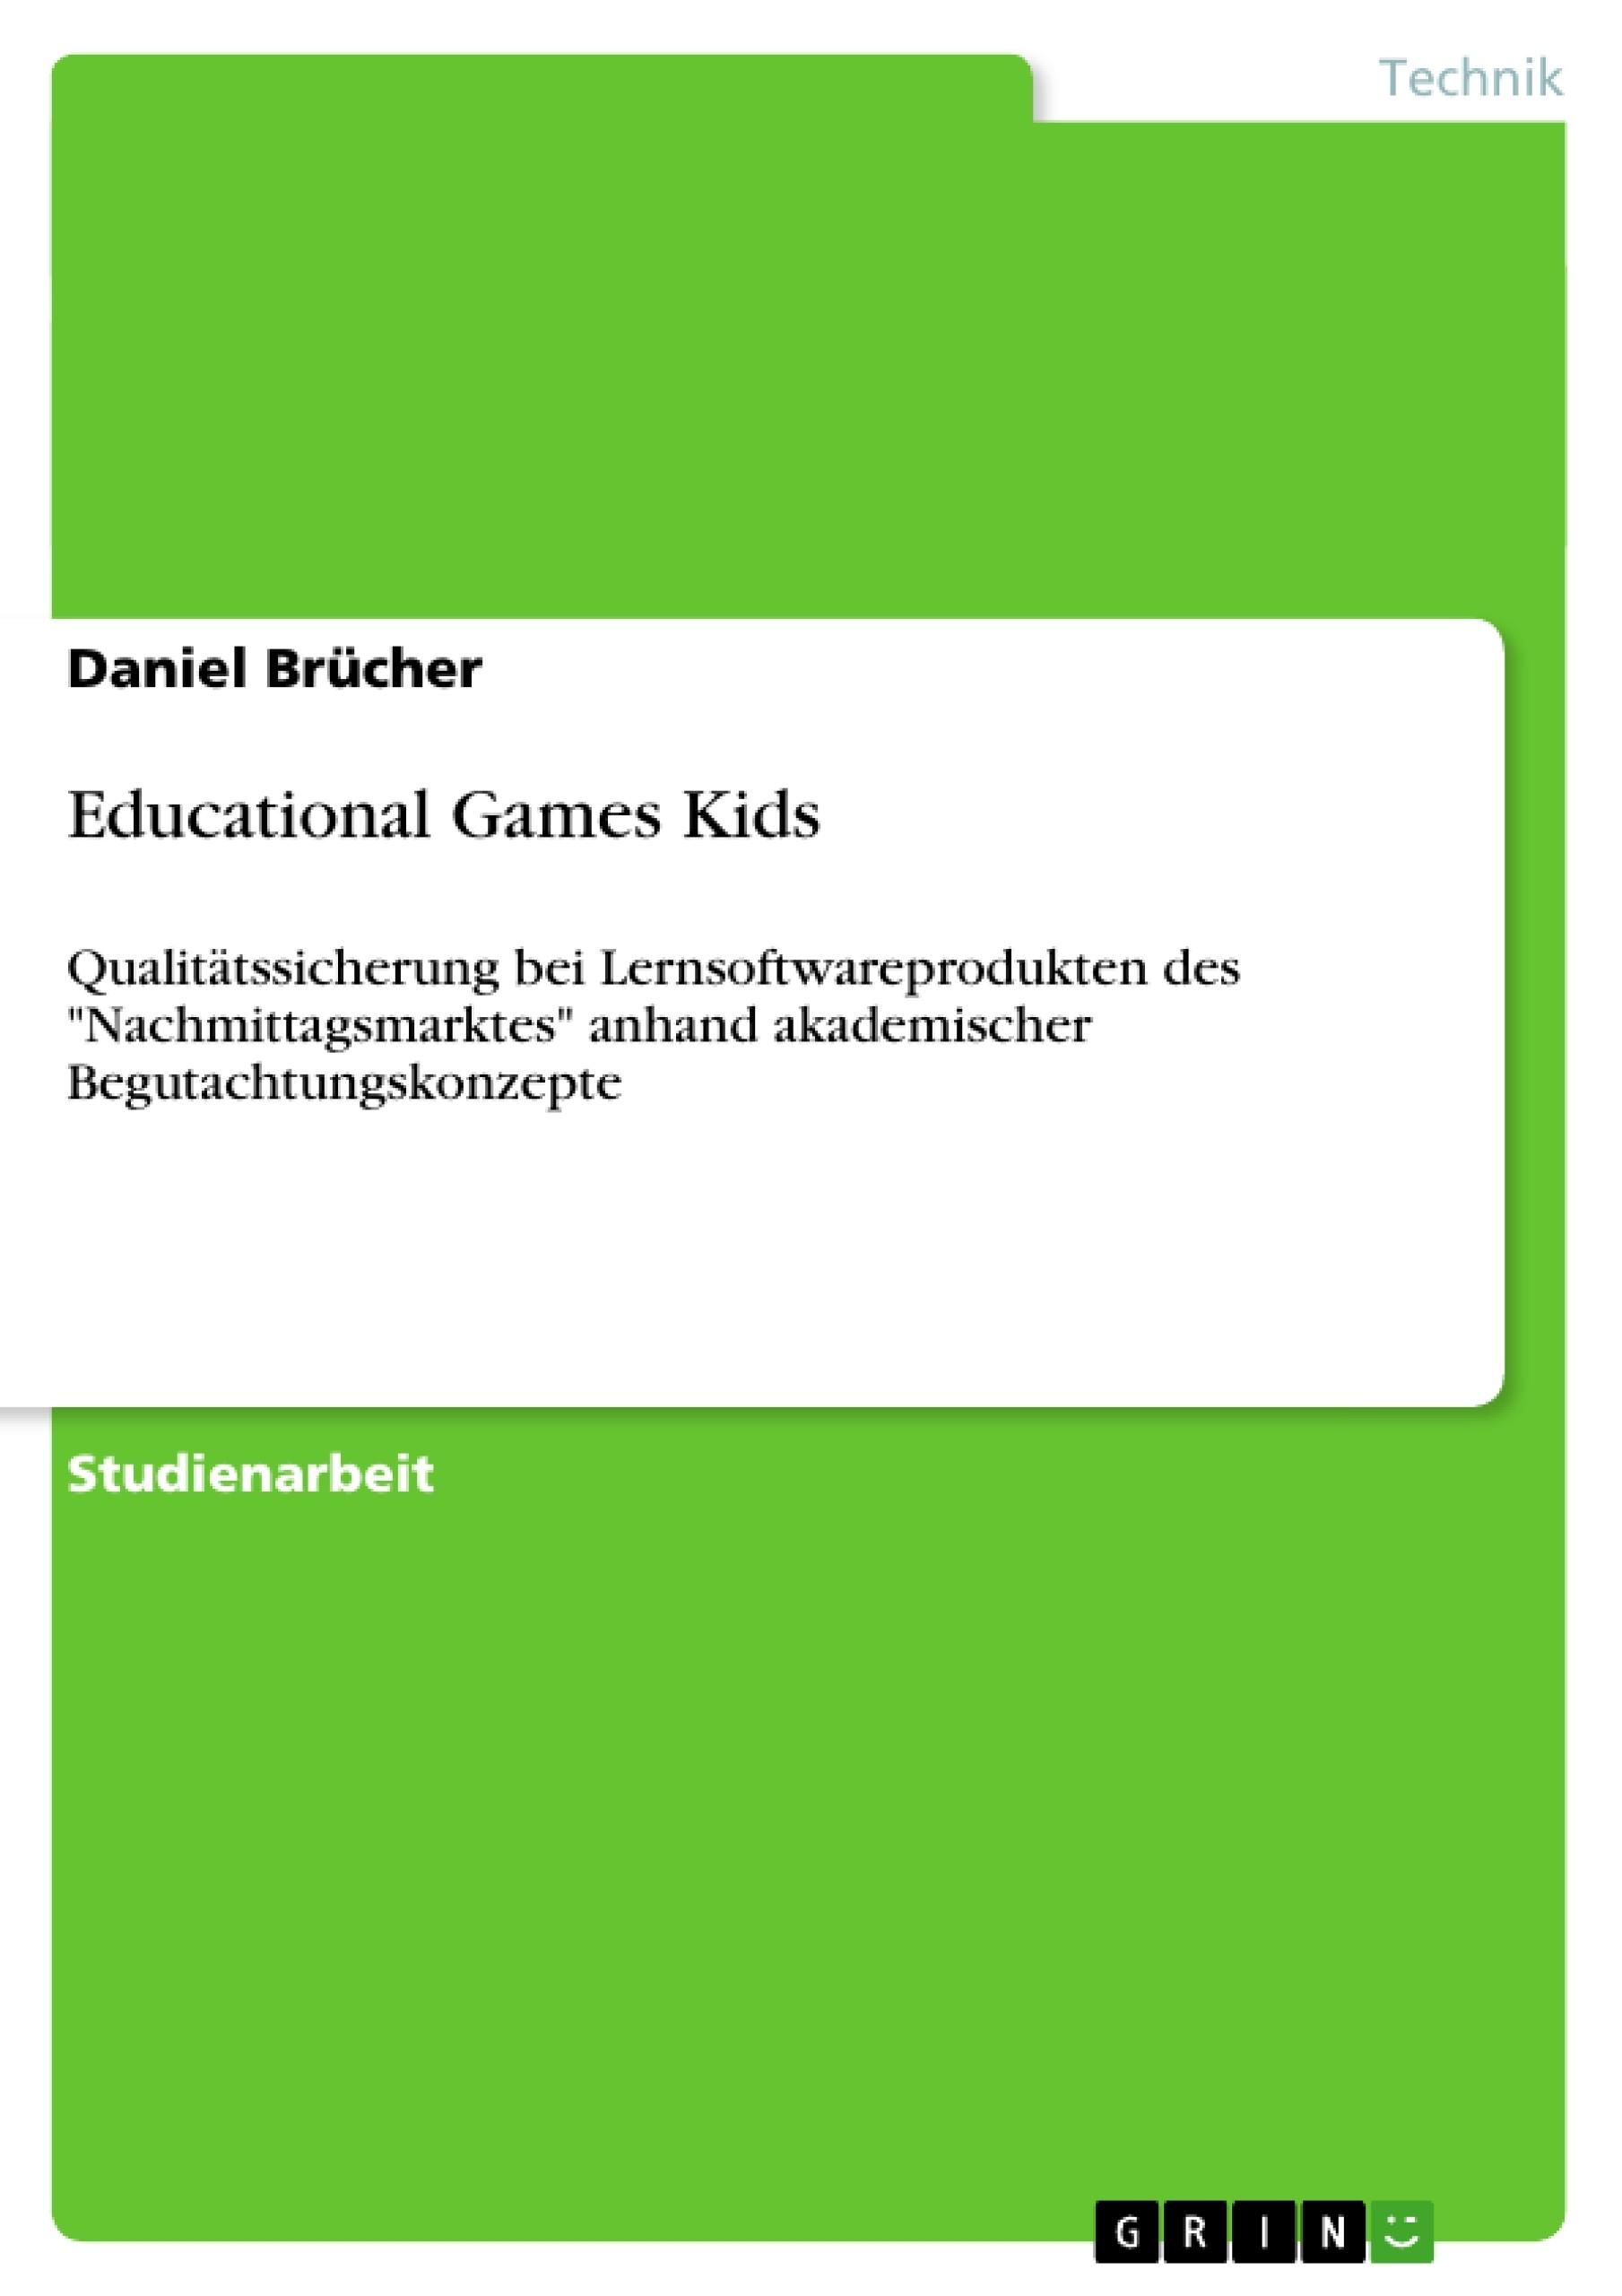 Titel: Educational Games Kids